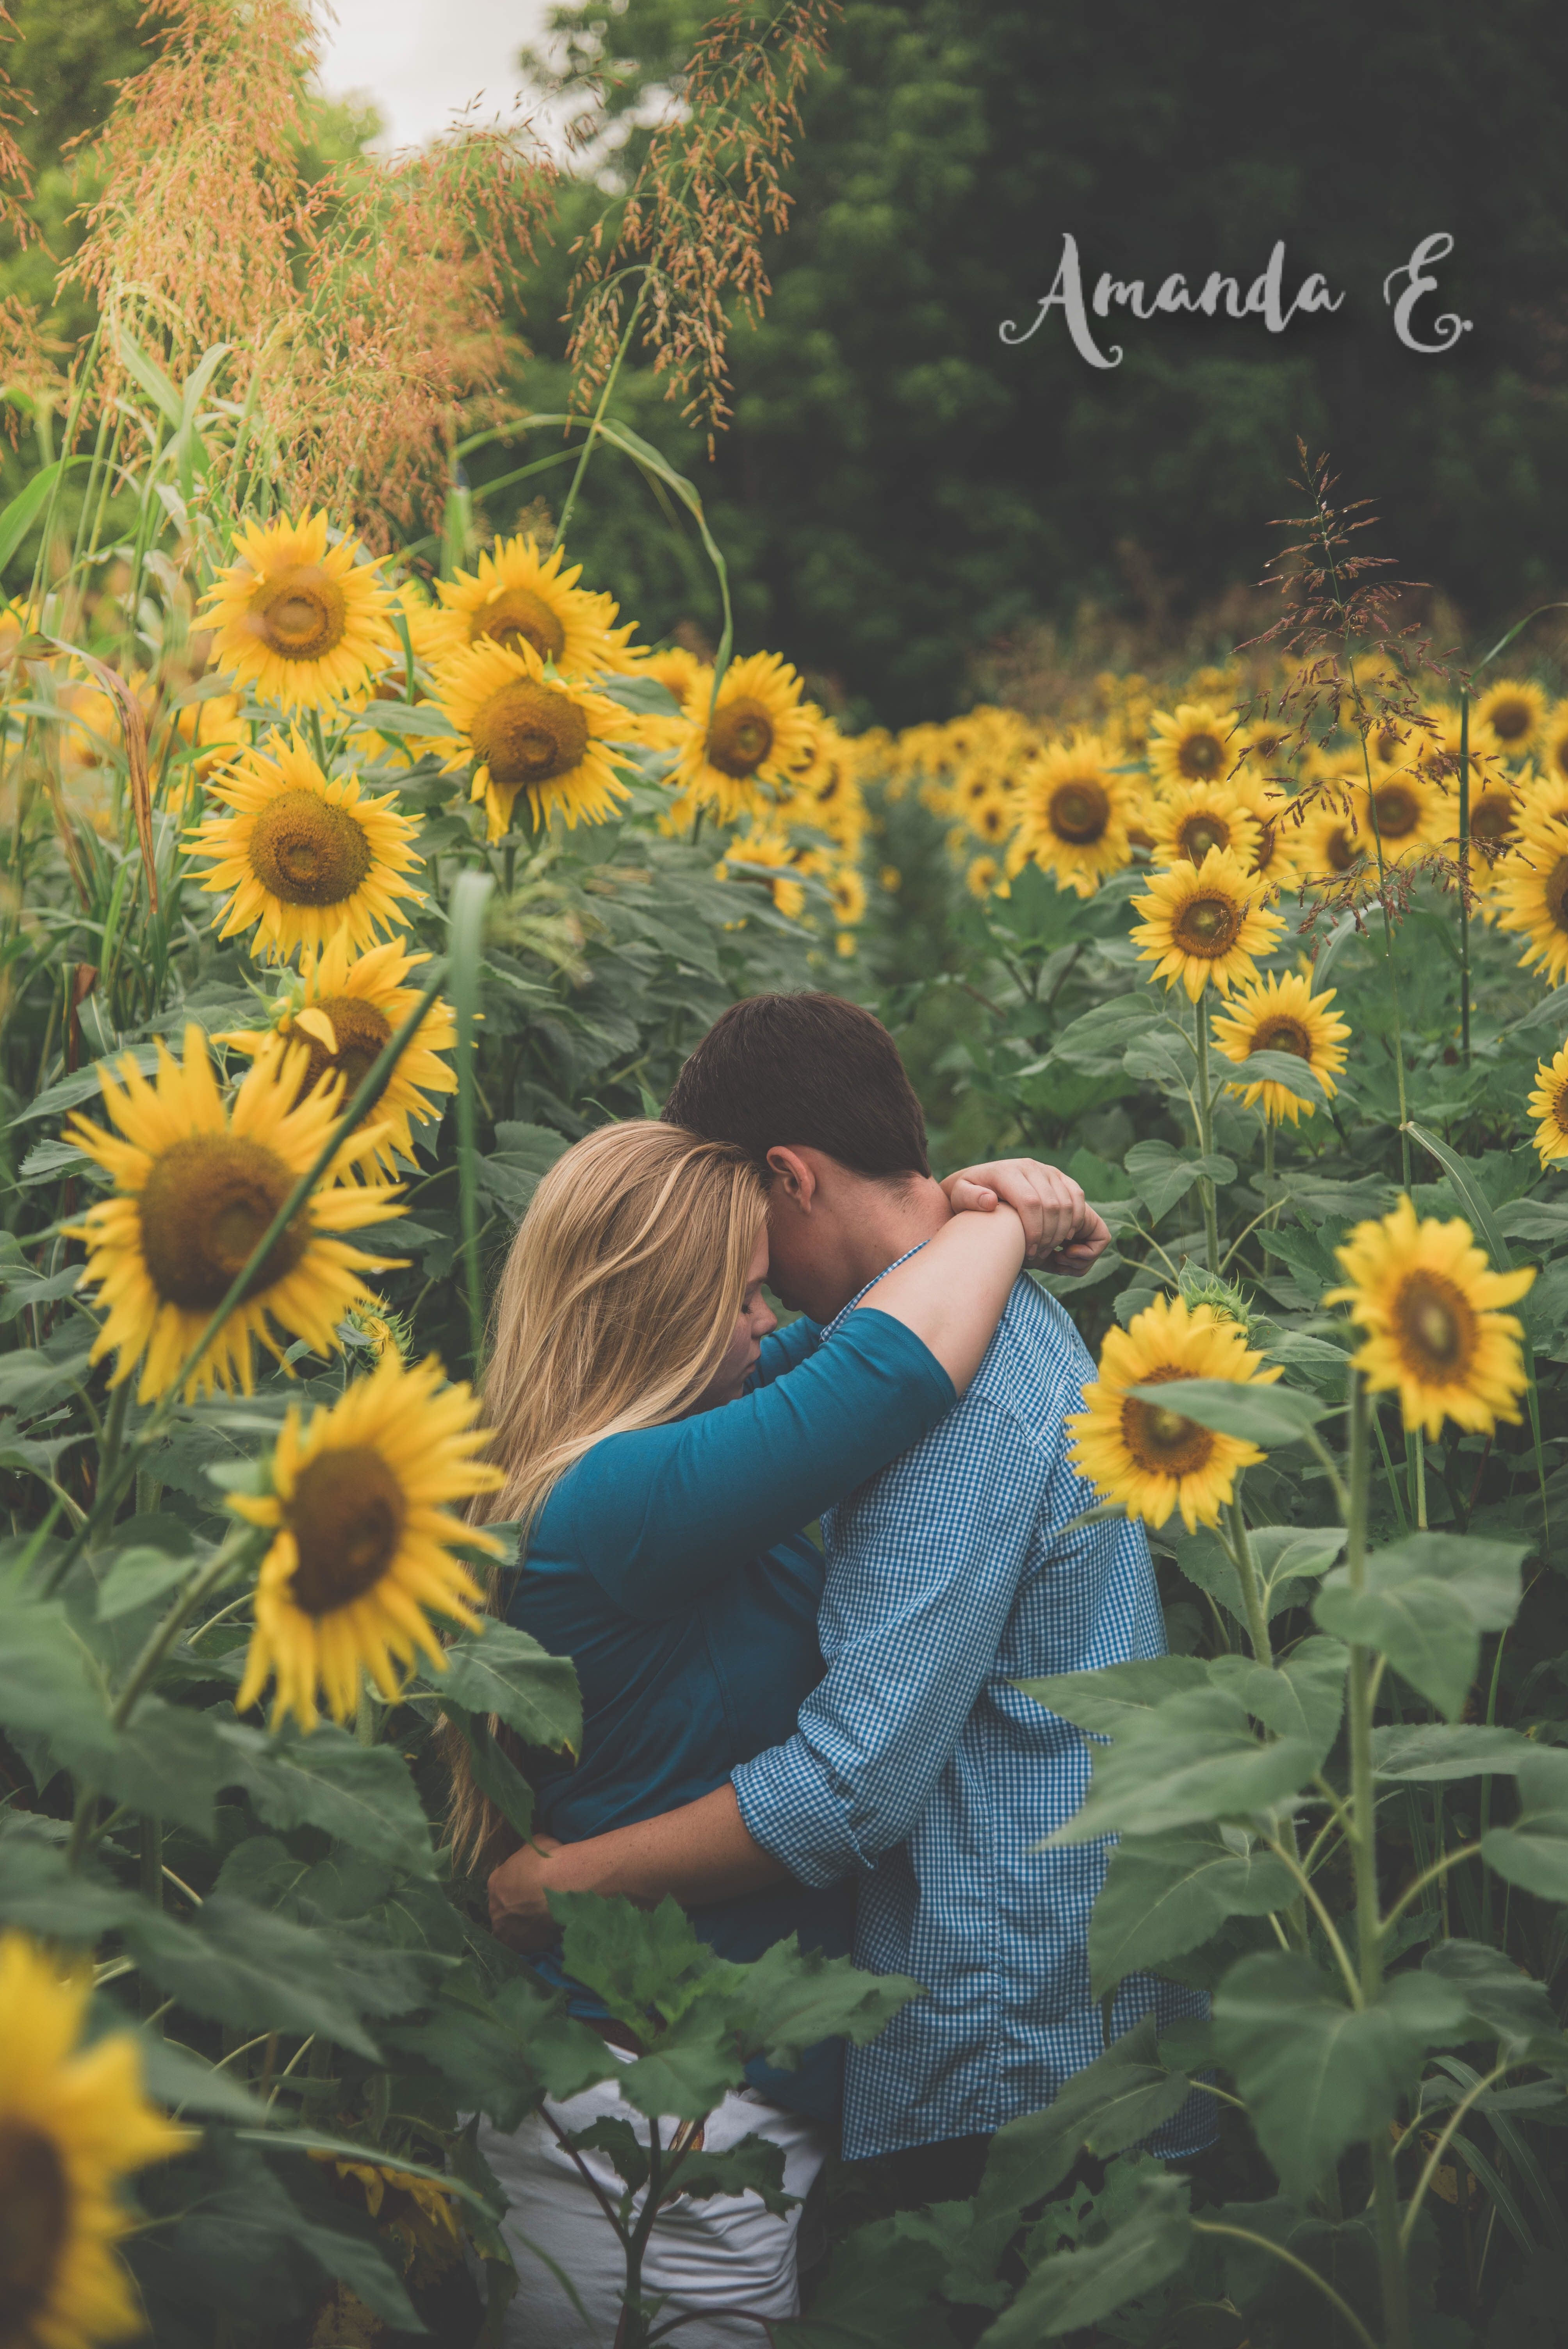 Sunflower Photoshoot | Sunflower photography